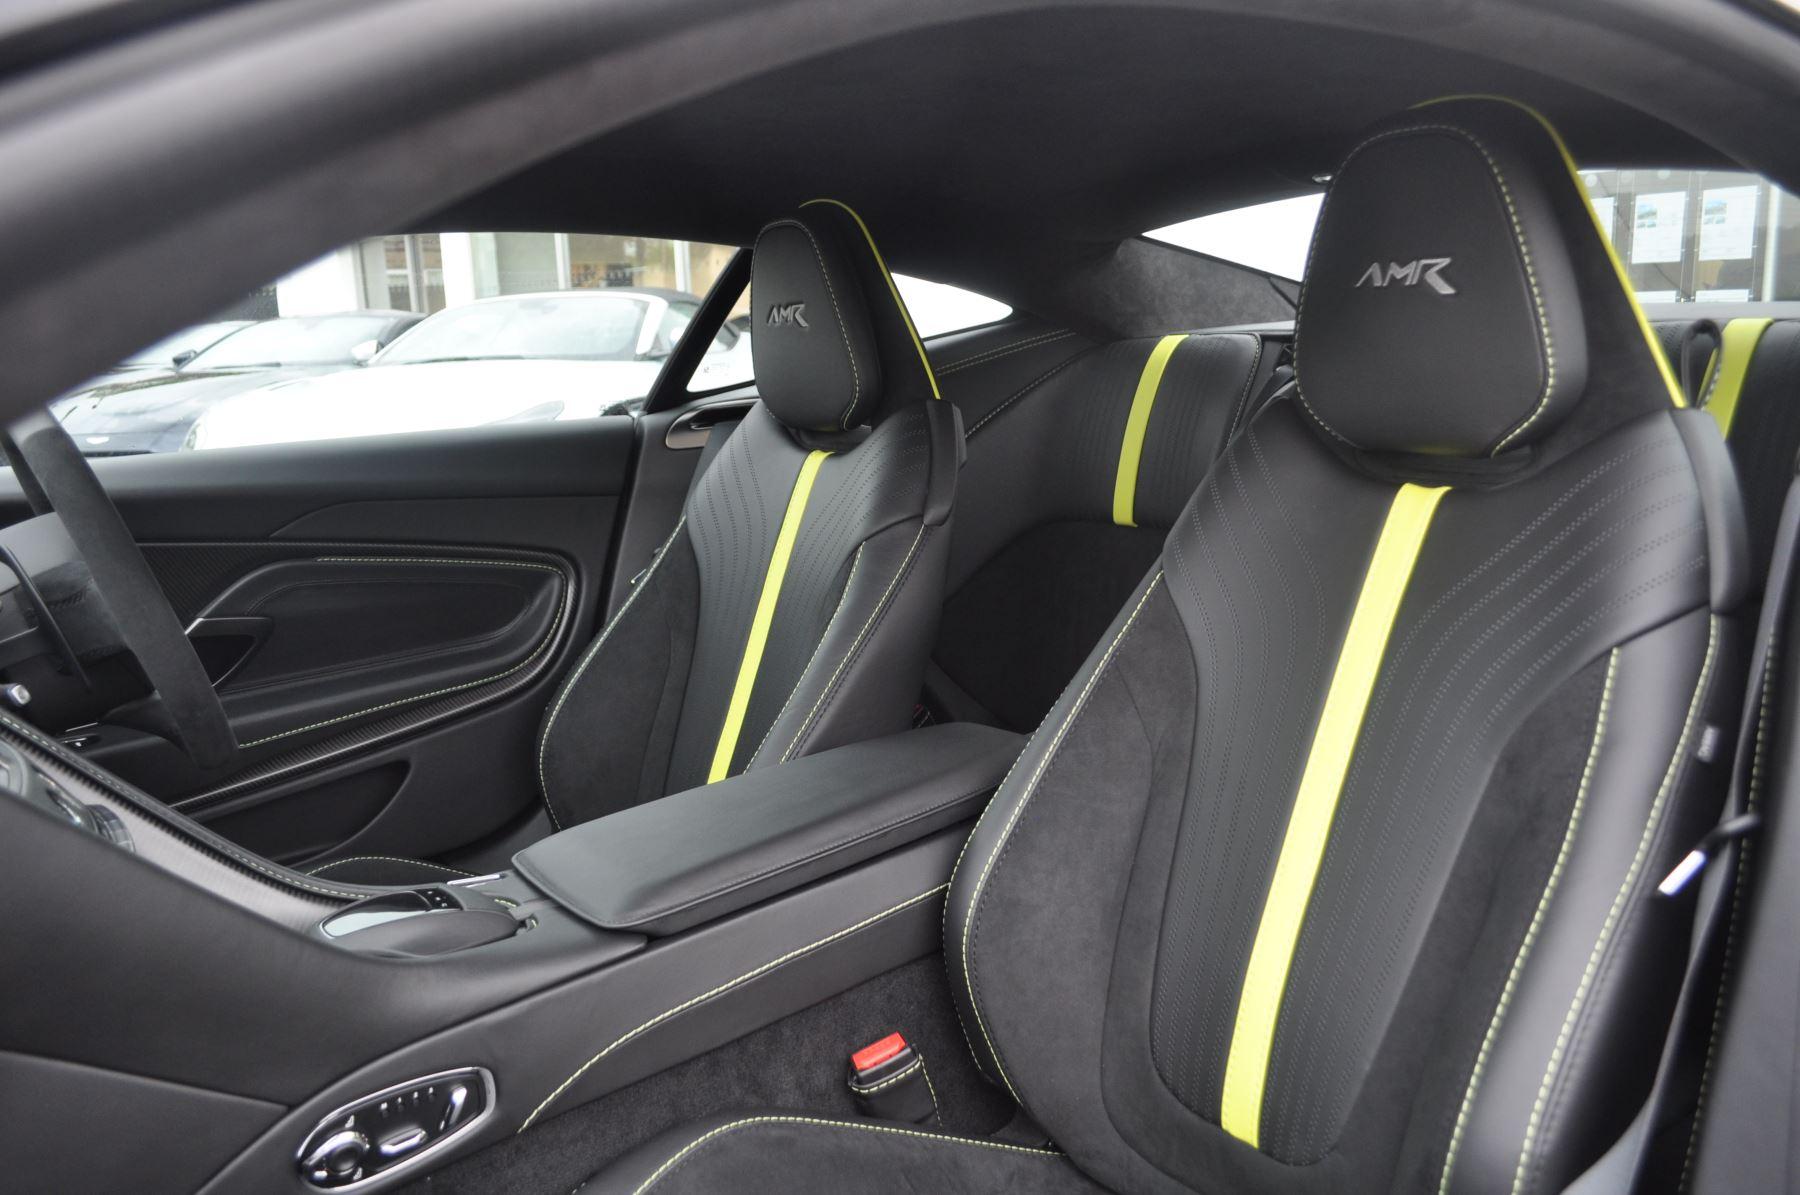 Aston Martin DB11 V12 AMR Touchtronic image 5